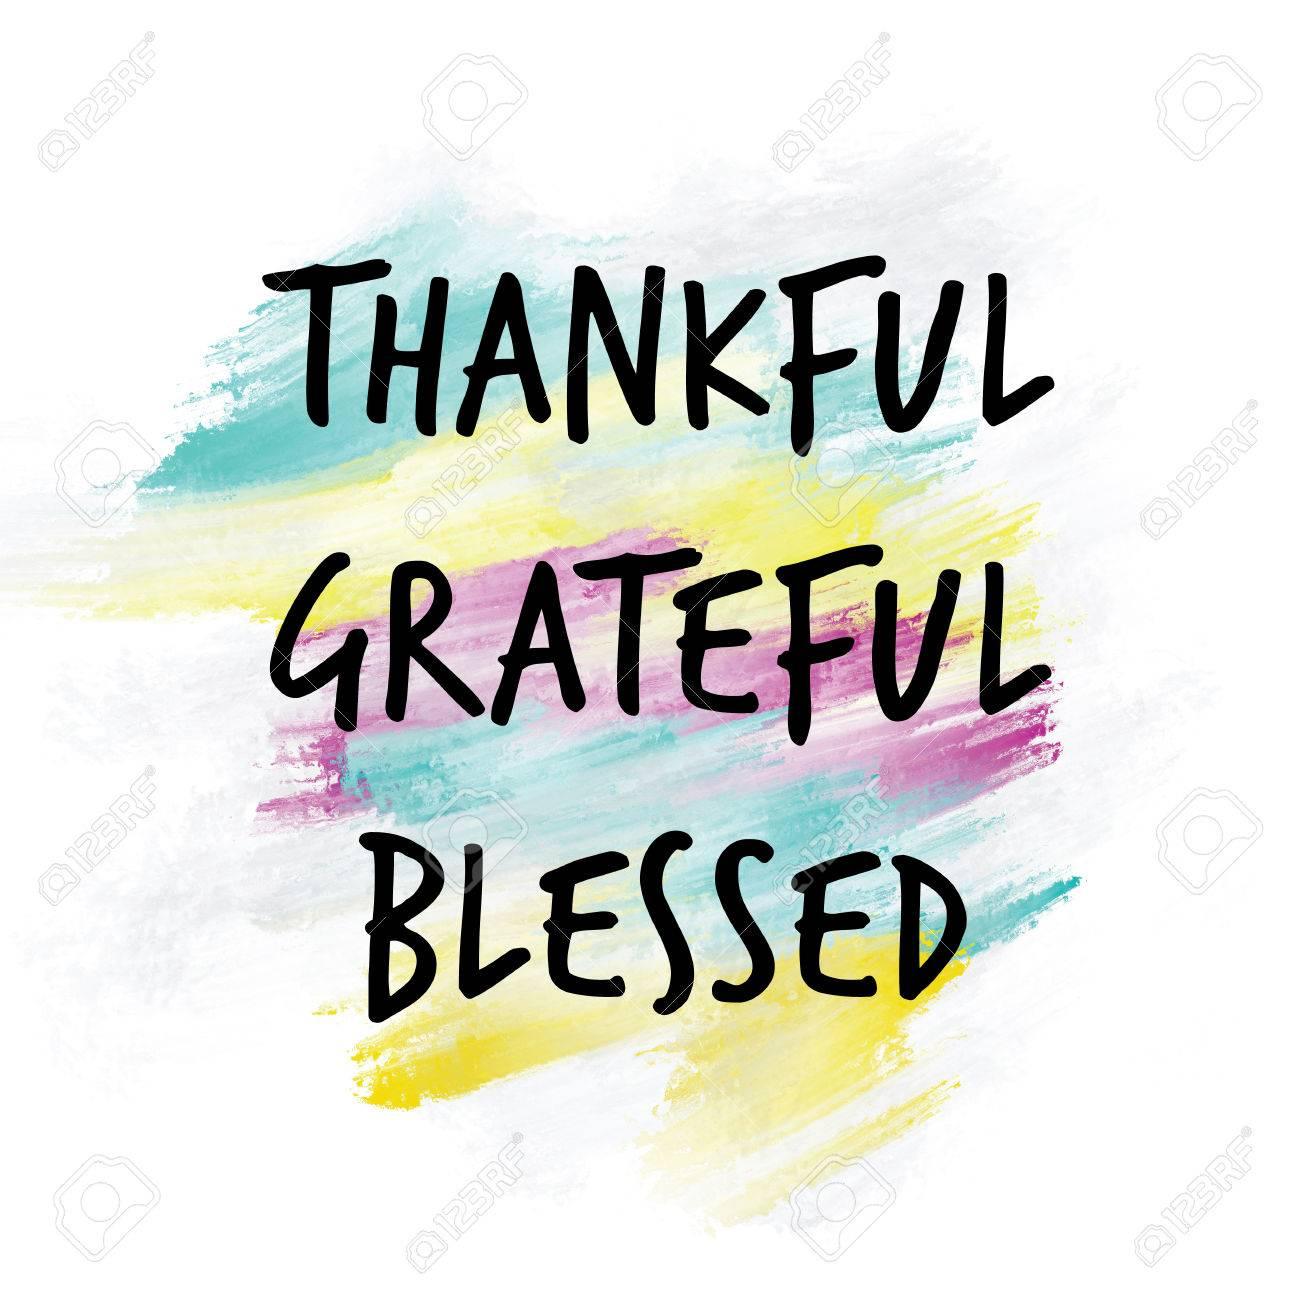 thankful grateful blessed written